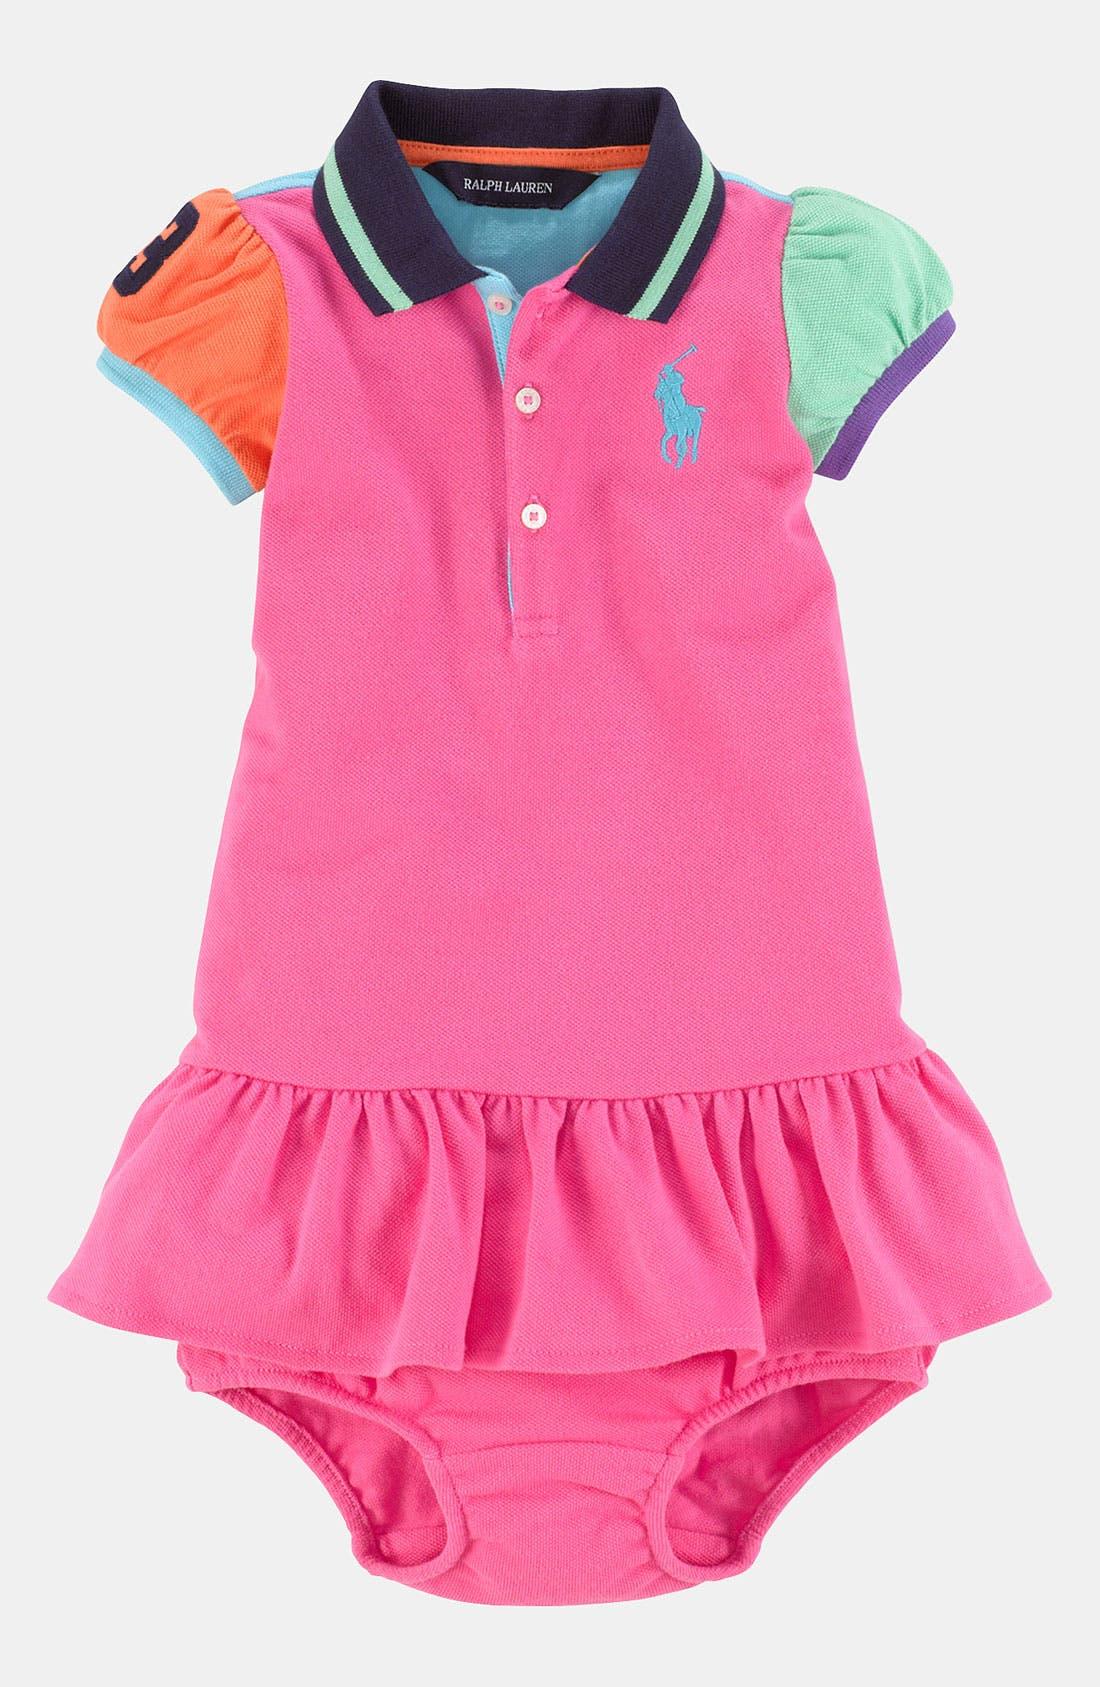 Main Image - Ralph Lauren Colorblock Dress & Bloomers (Infant)